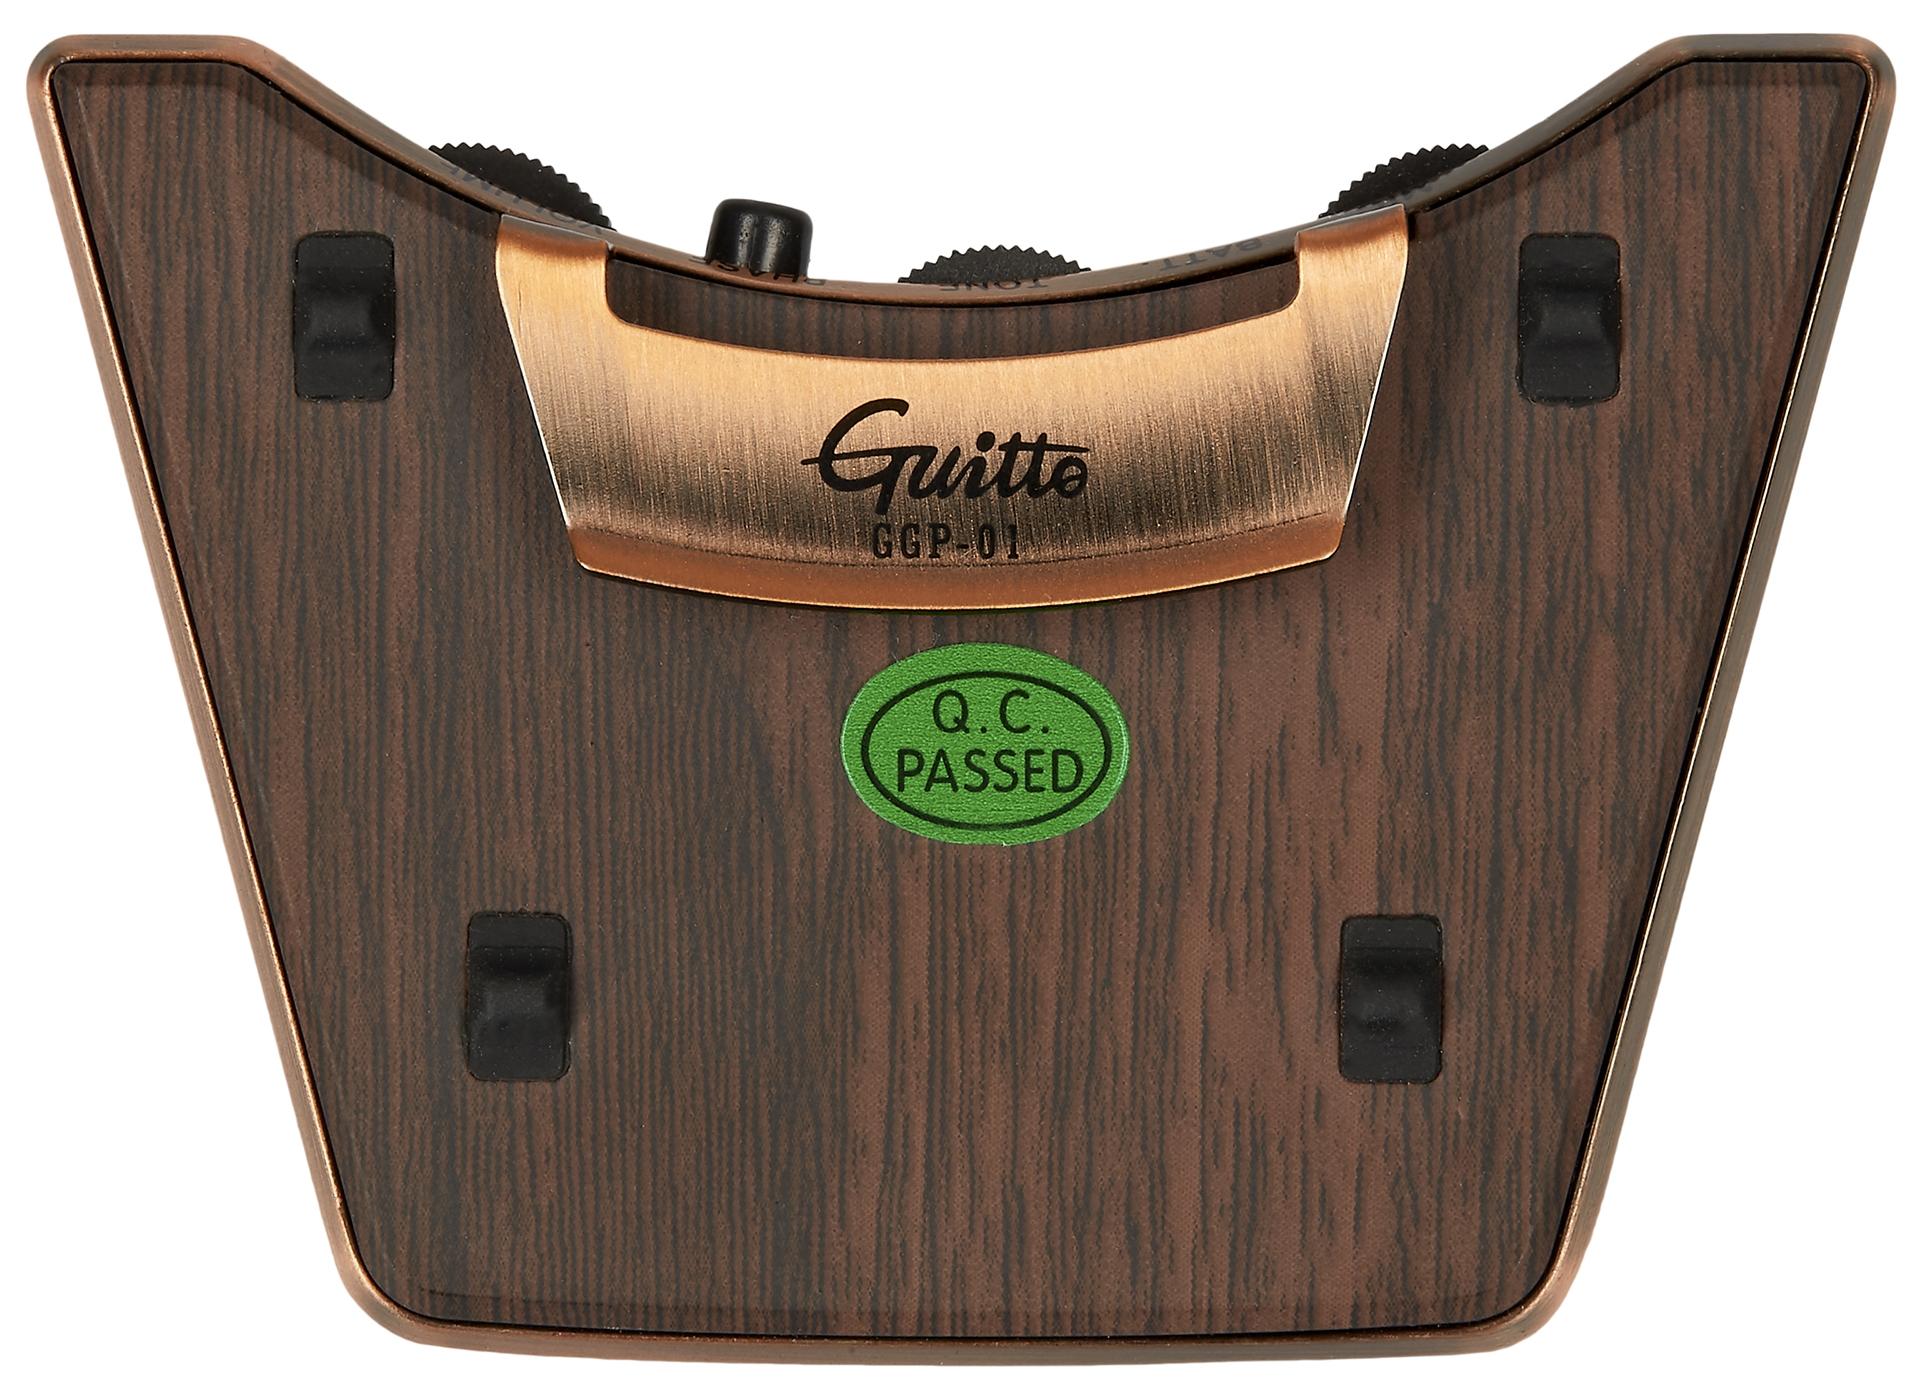 GUITTO GGP-01 Pickup